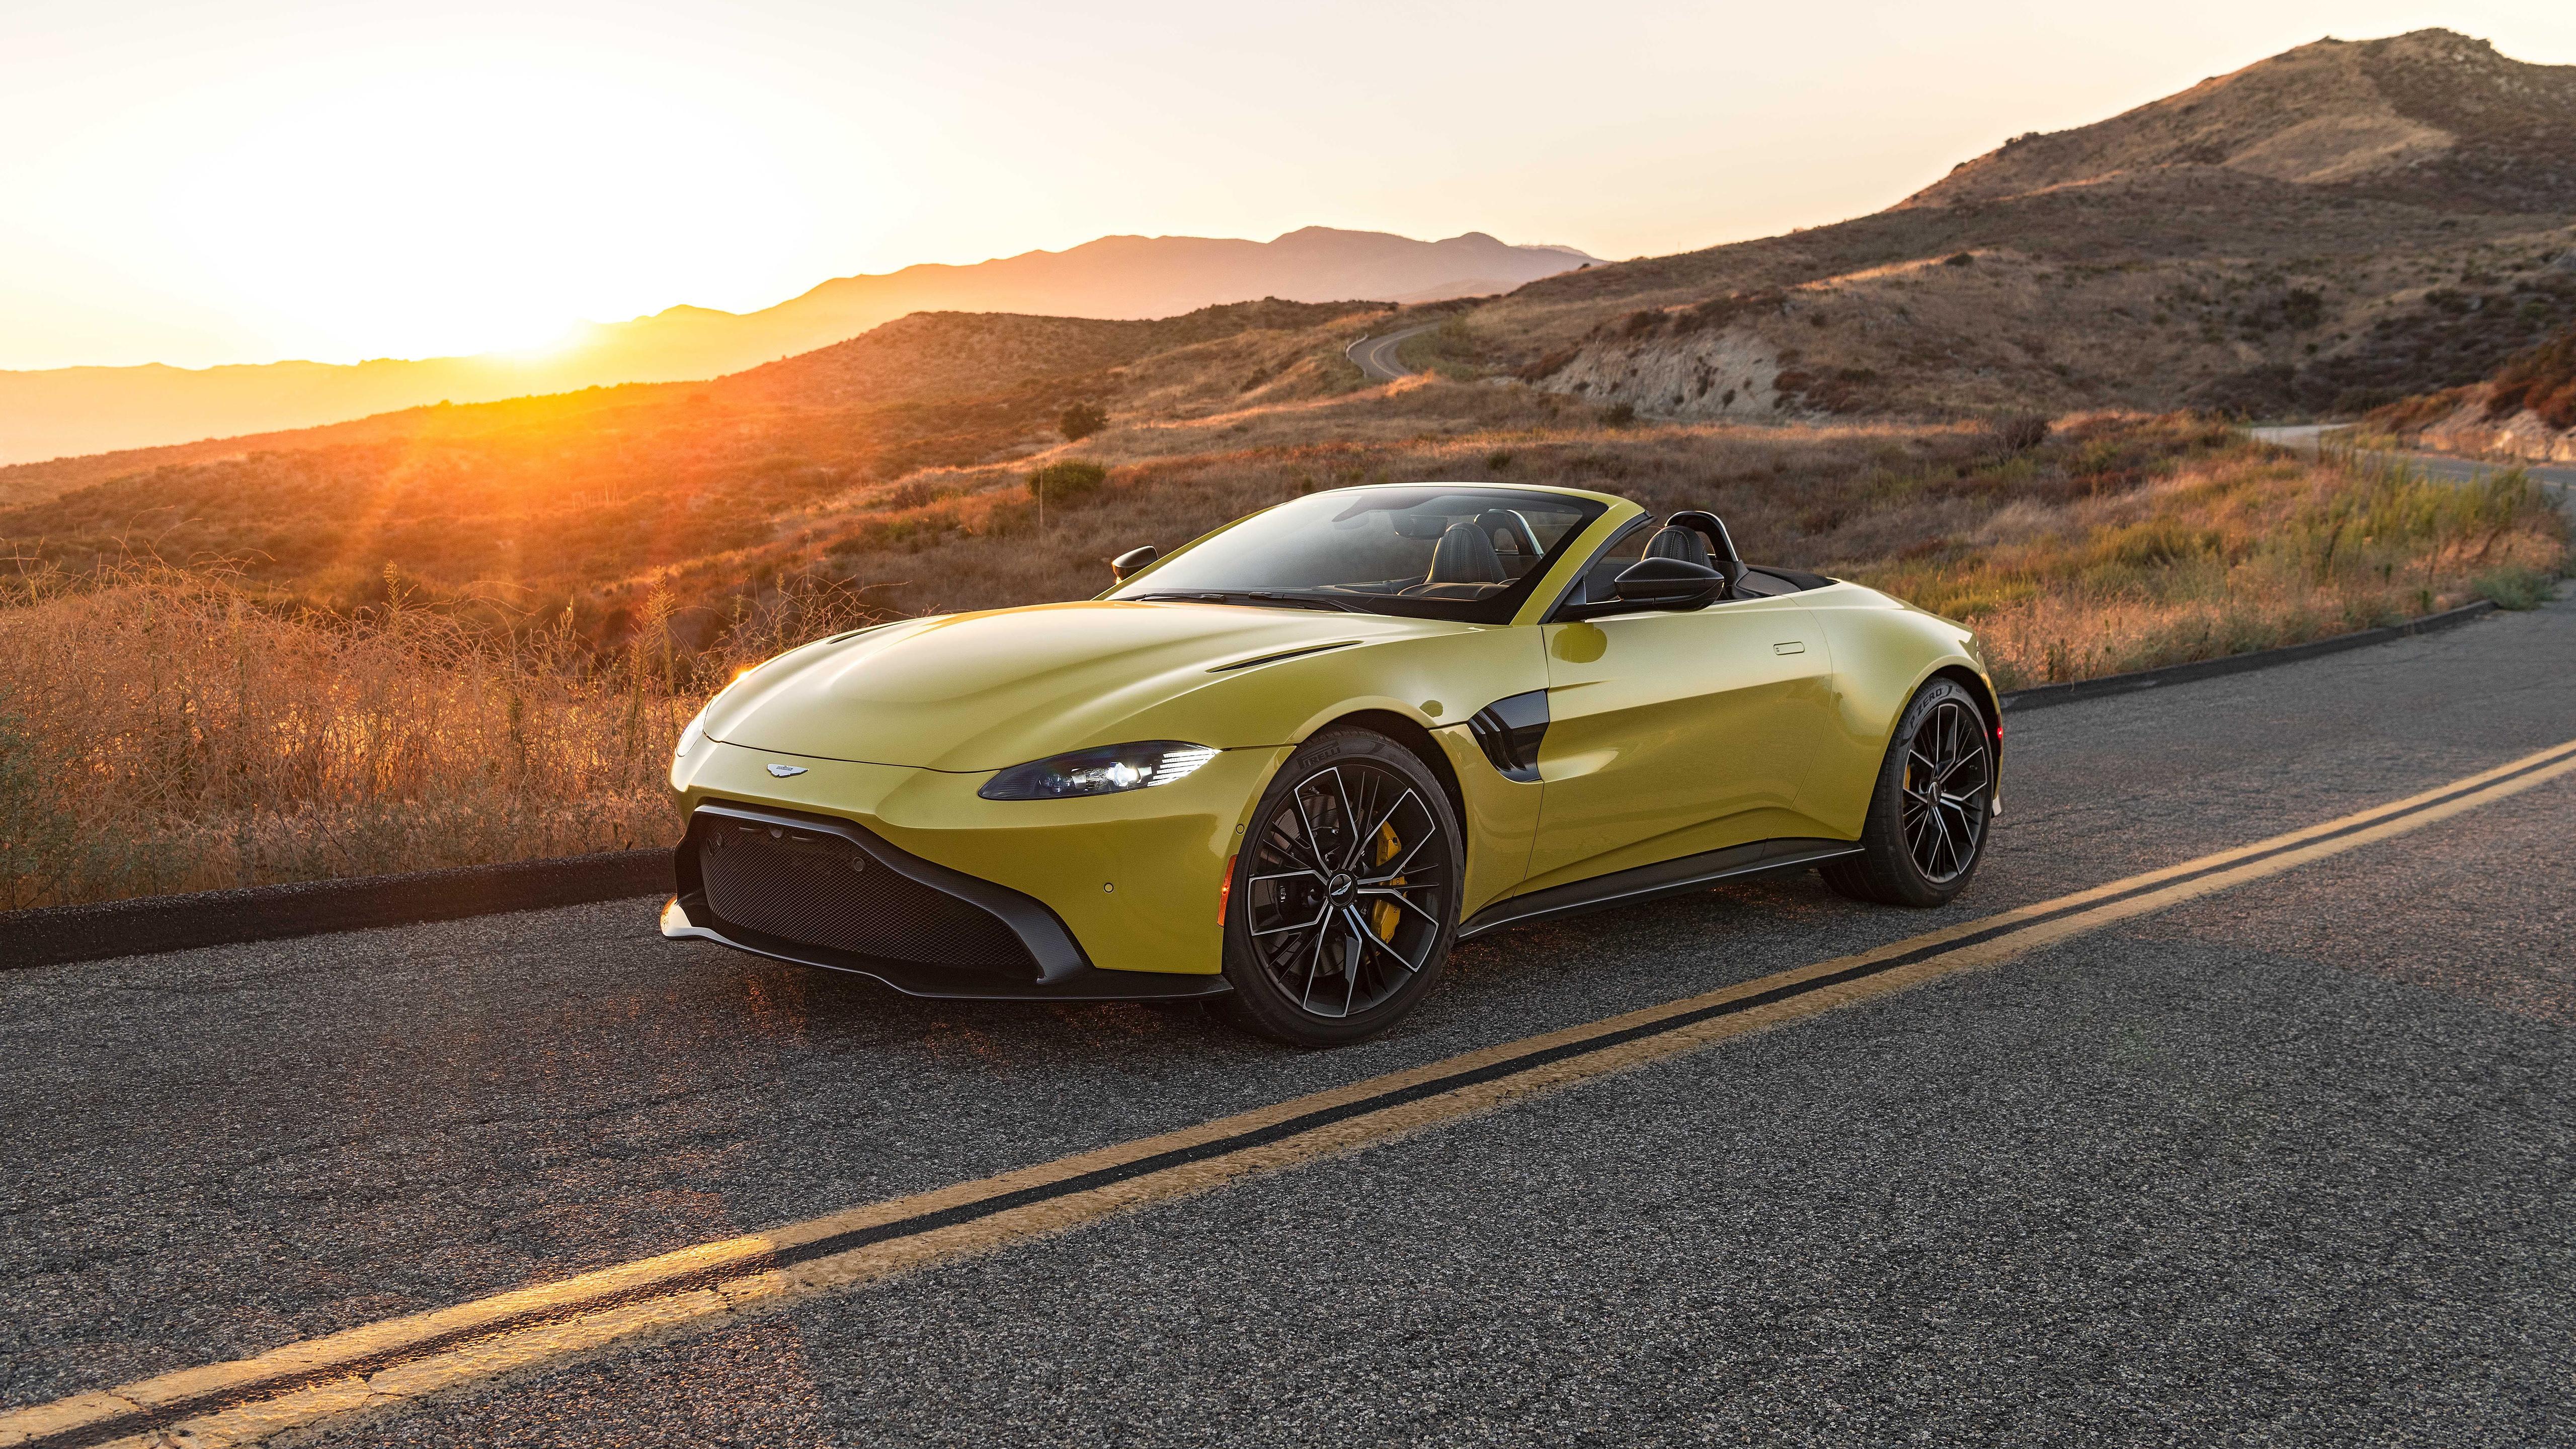 2021 Aston Martin Vantage Roadster Wallpaper Hd Car Wallpapers Id 16078